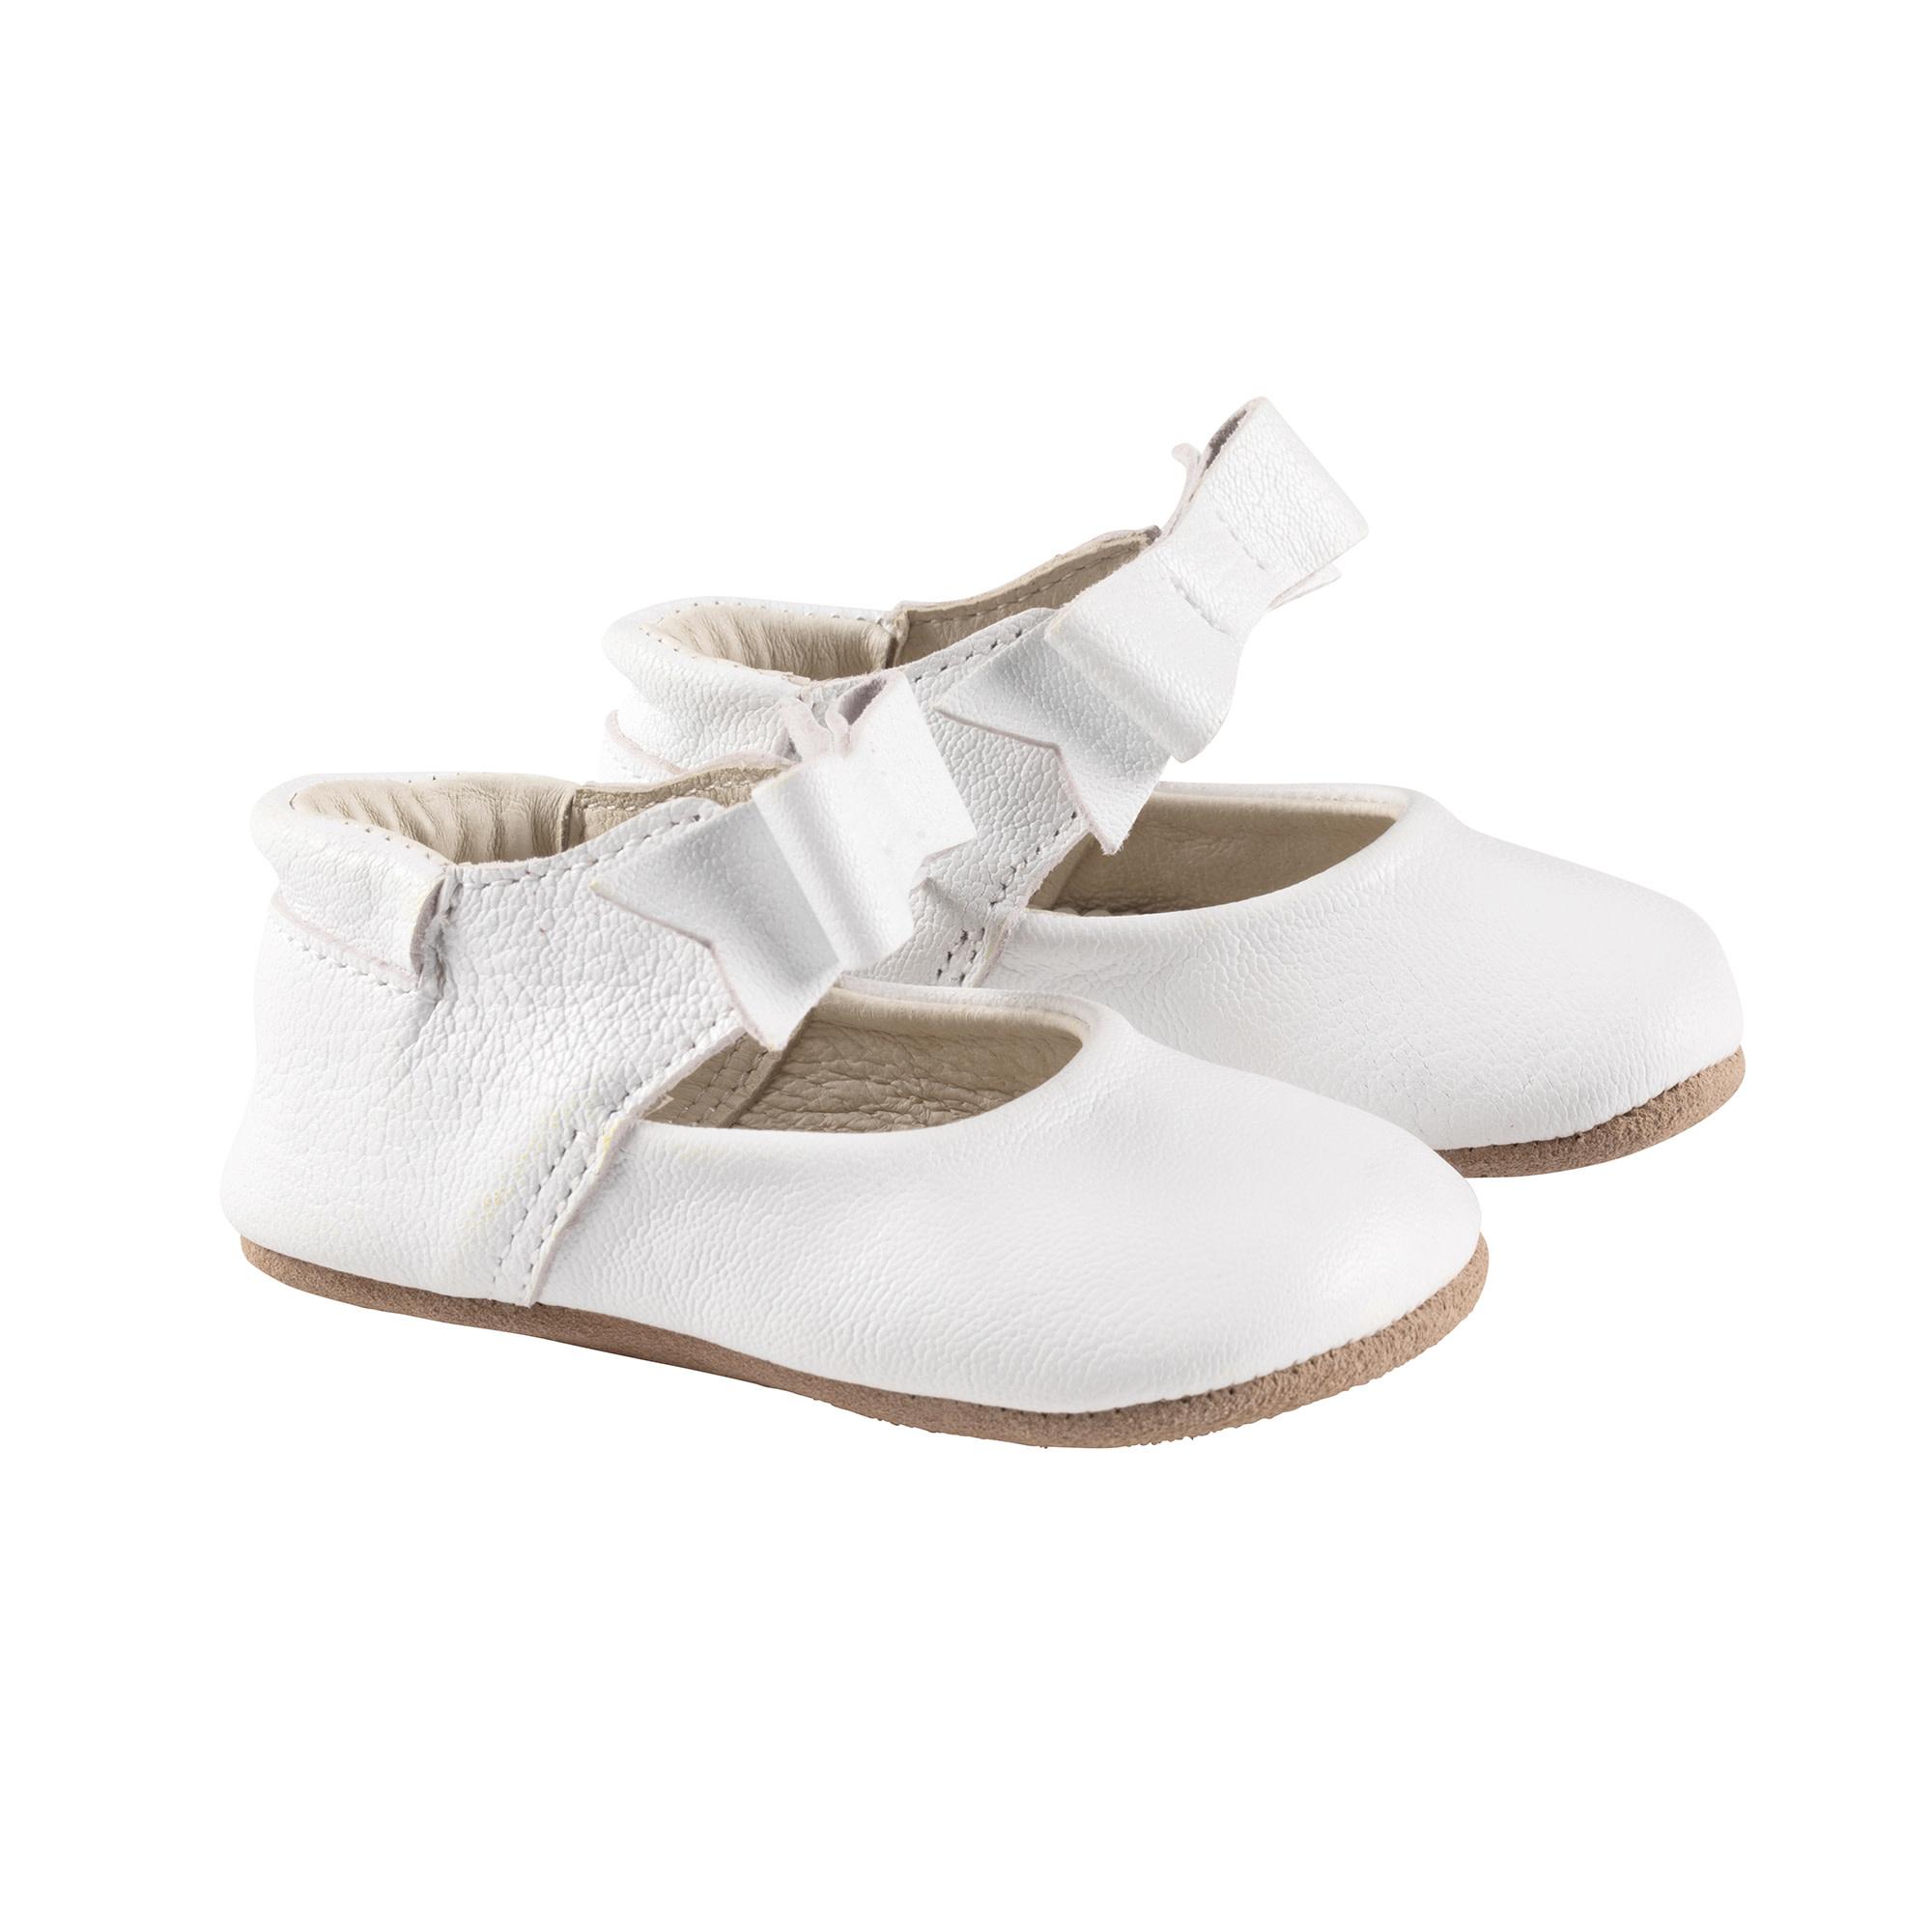 Sofia White Robeez Shoes - First Kicks